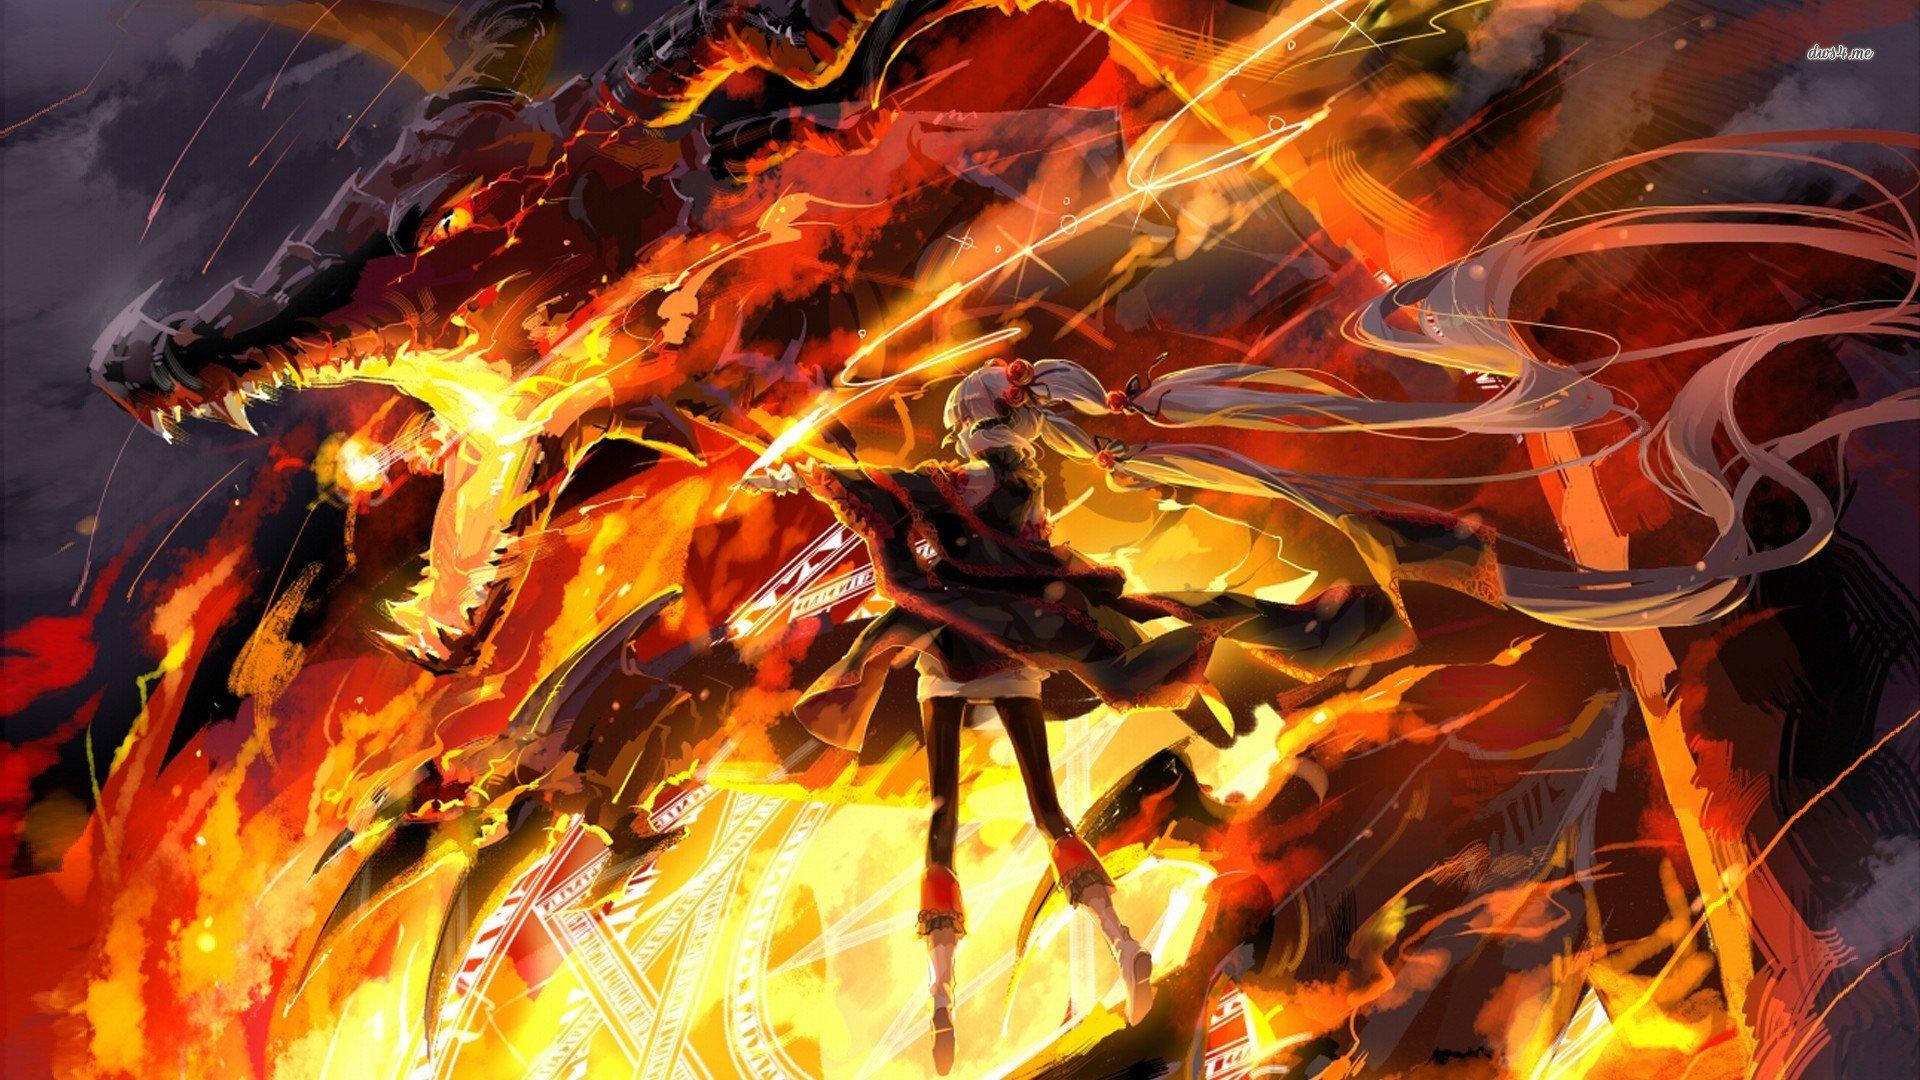 Fire Dragon Wallpaper